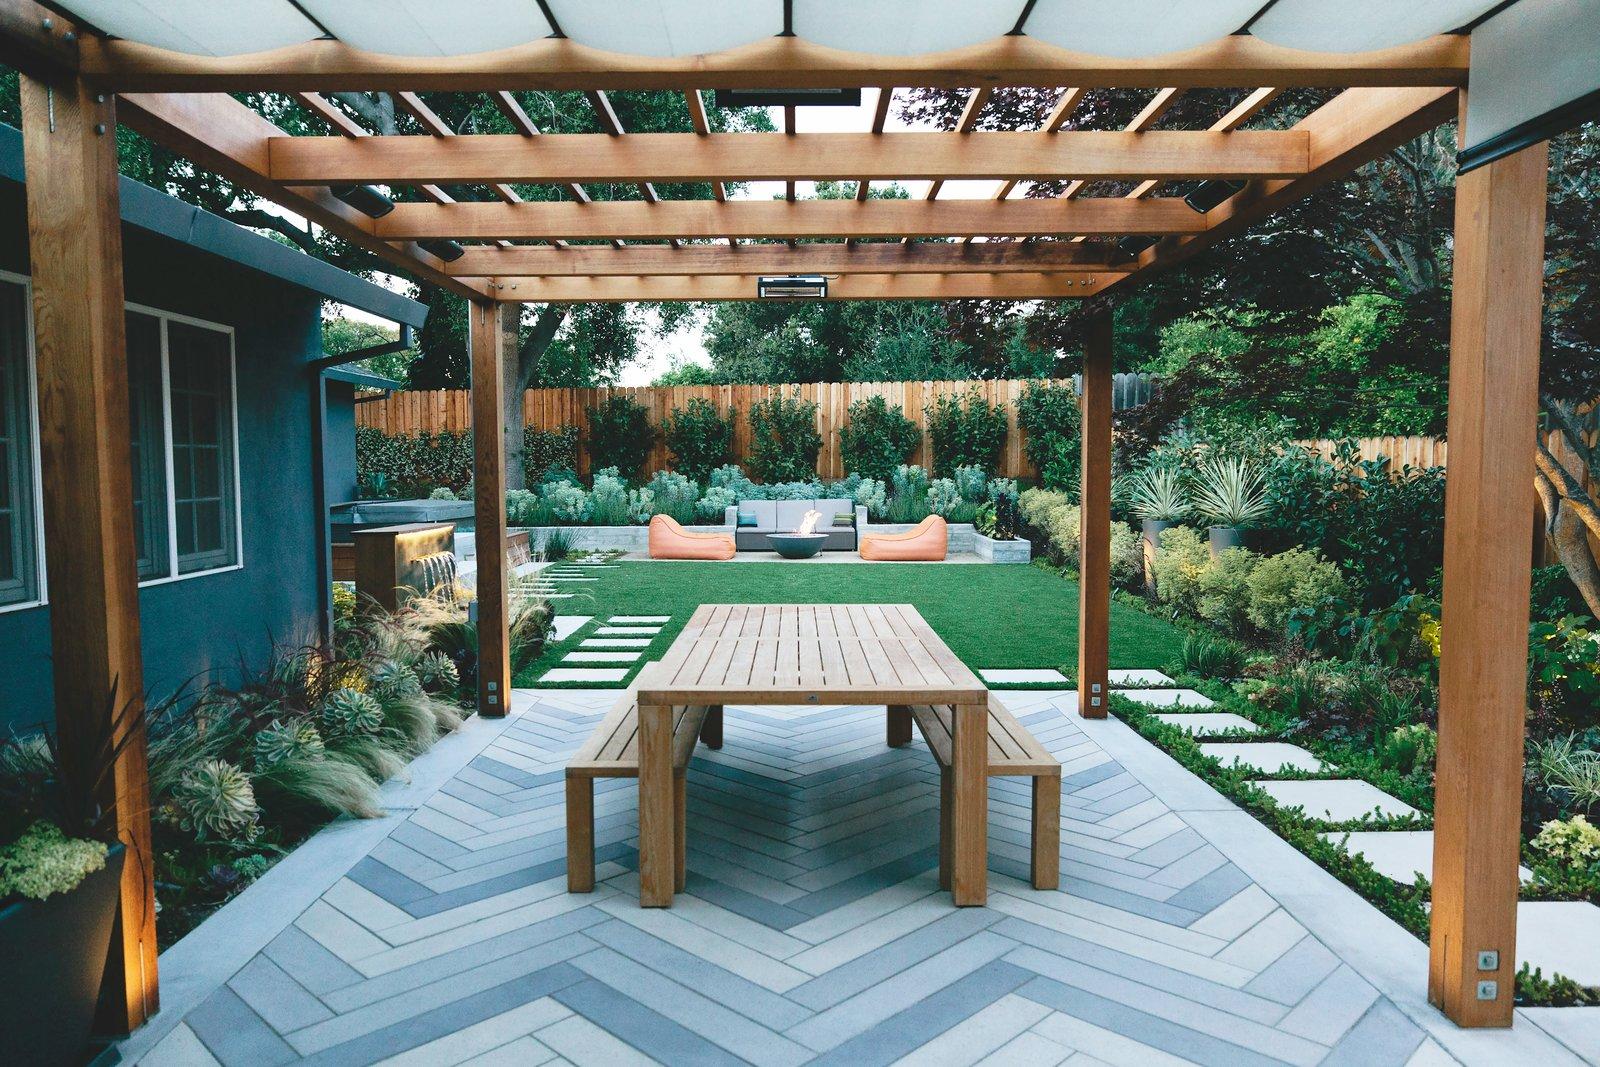 Create a Bold Backyard Statement With These Large Concrete ... on Small Backyard Pavers id=19991